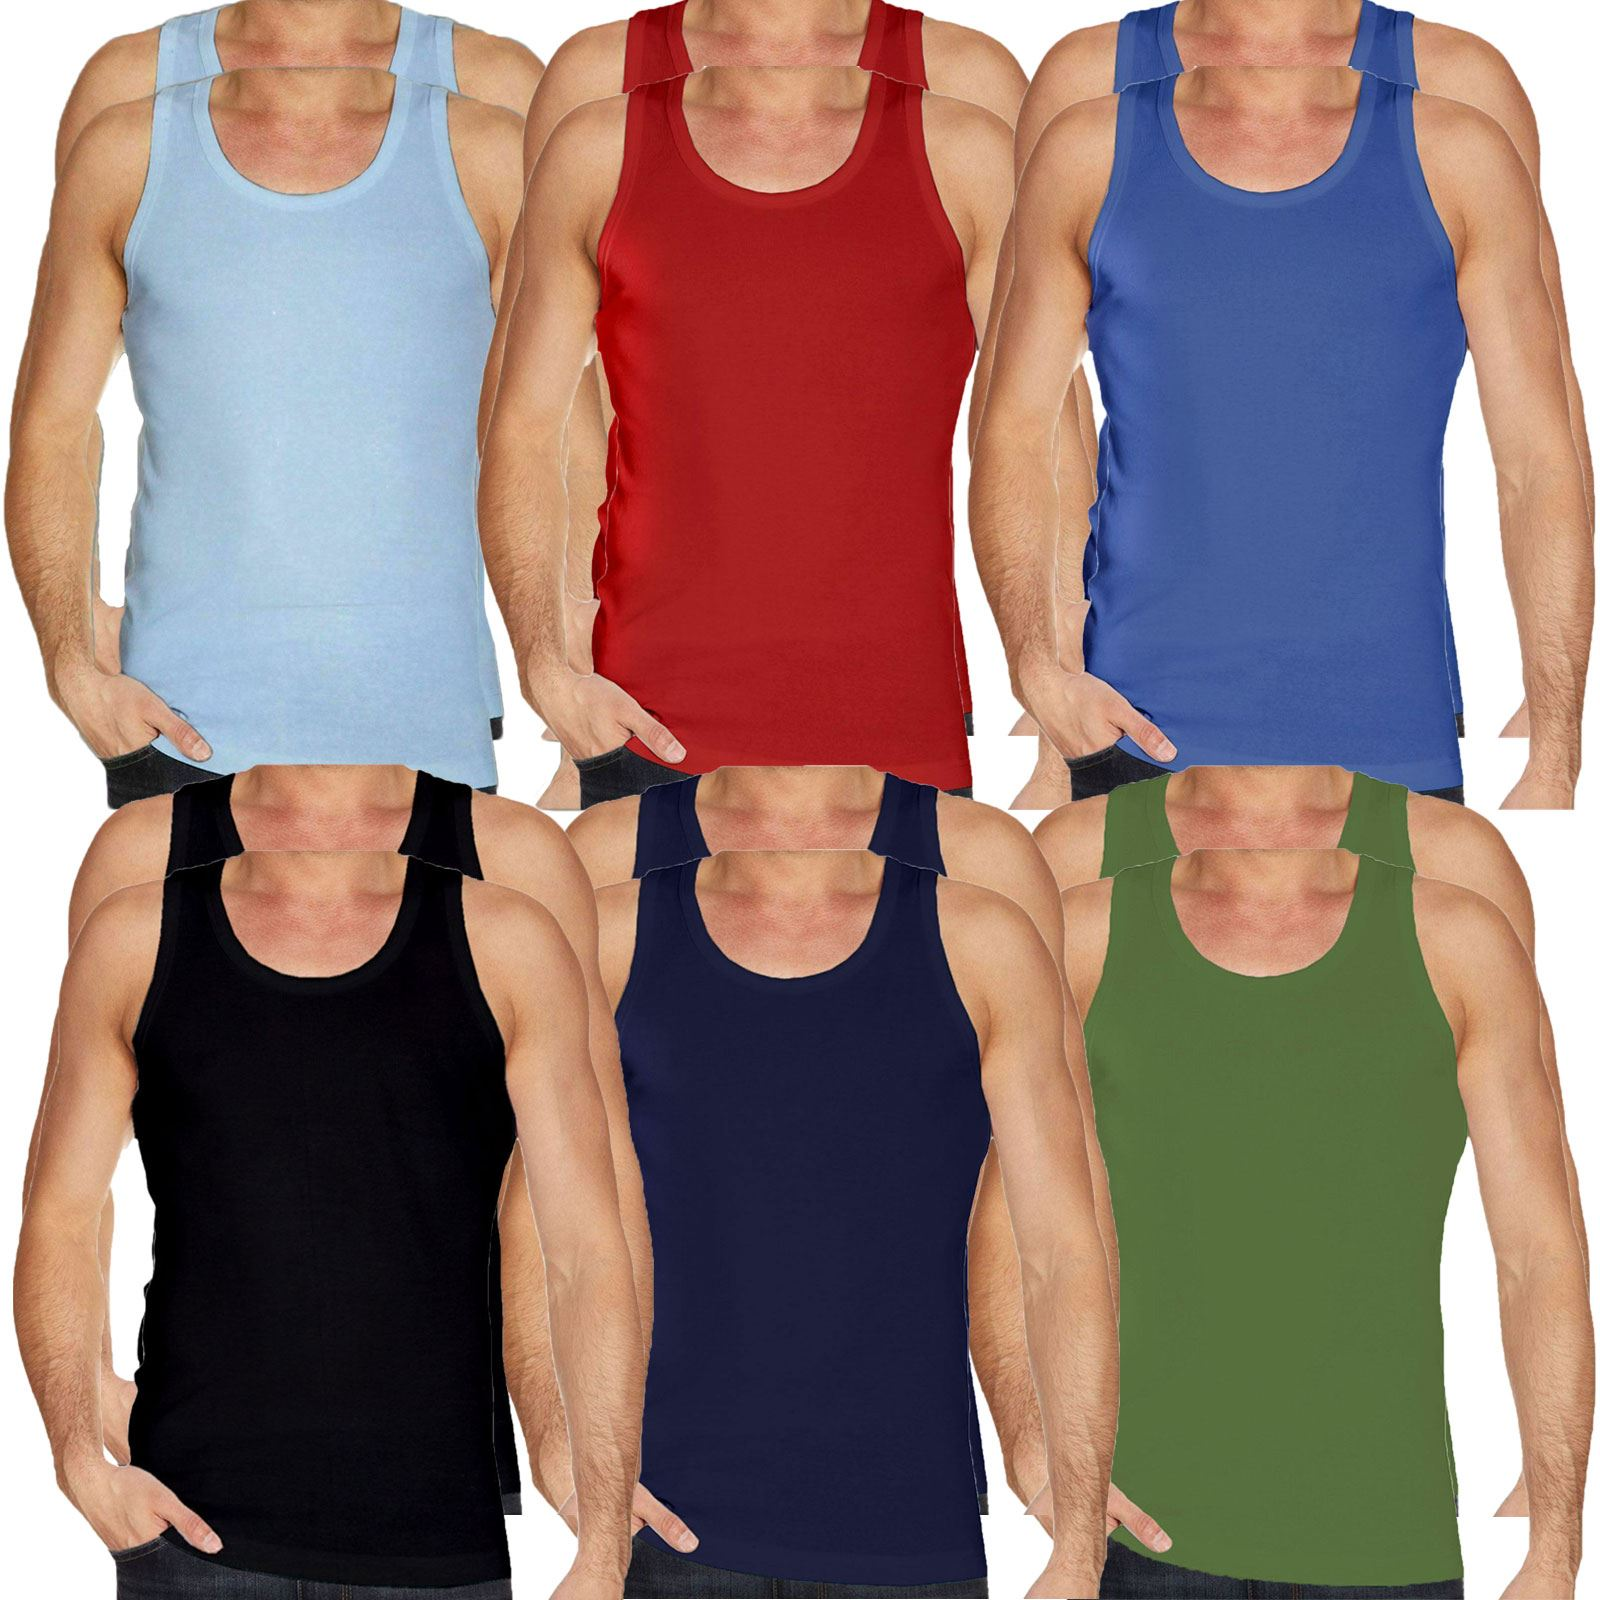 Mens Vest Plain Tank Top Sports T Shirt Sports Fitness Gym Summer Men/'s Clothing